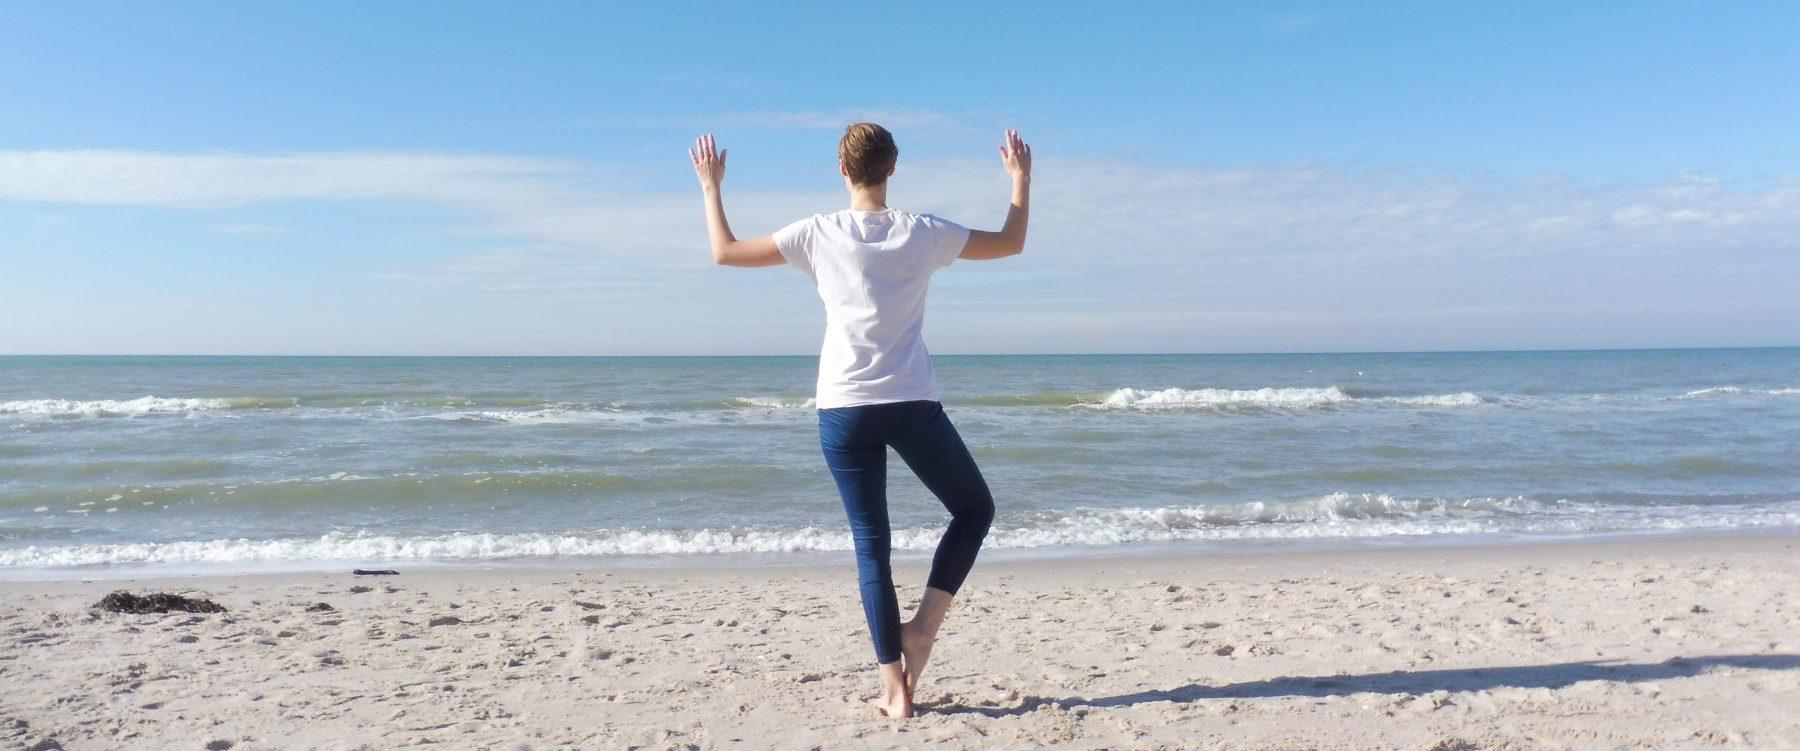 Yoga am Weststrand auf dem Darss